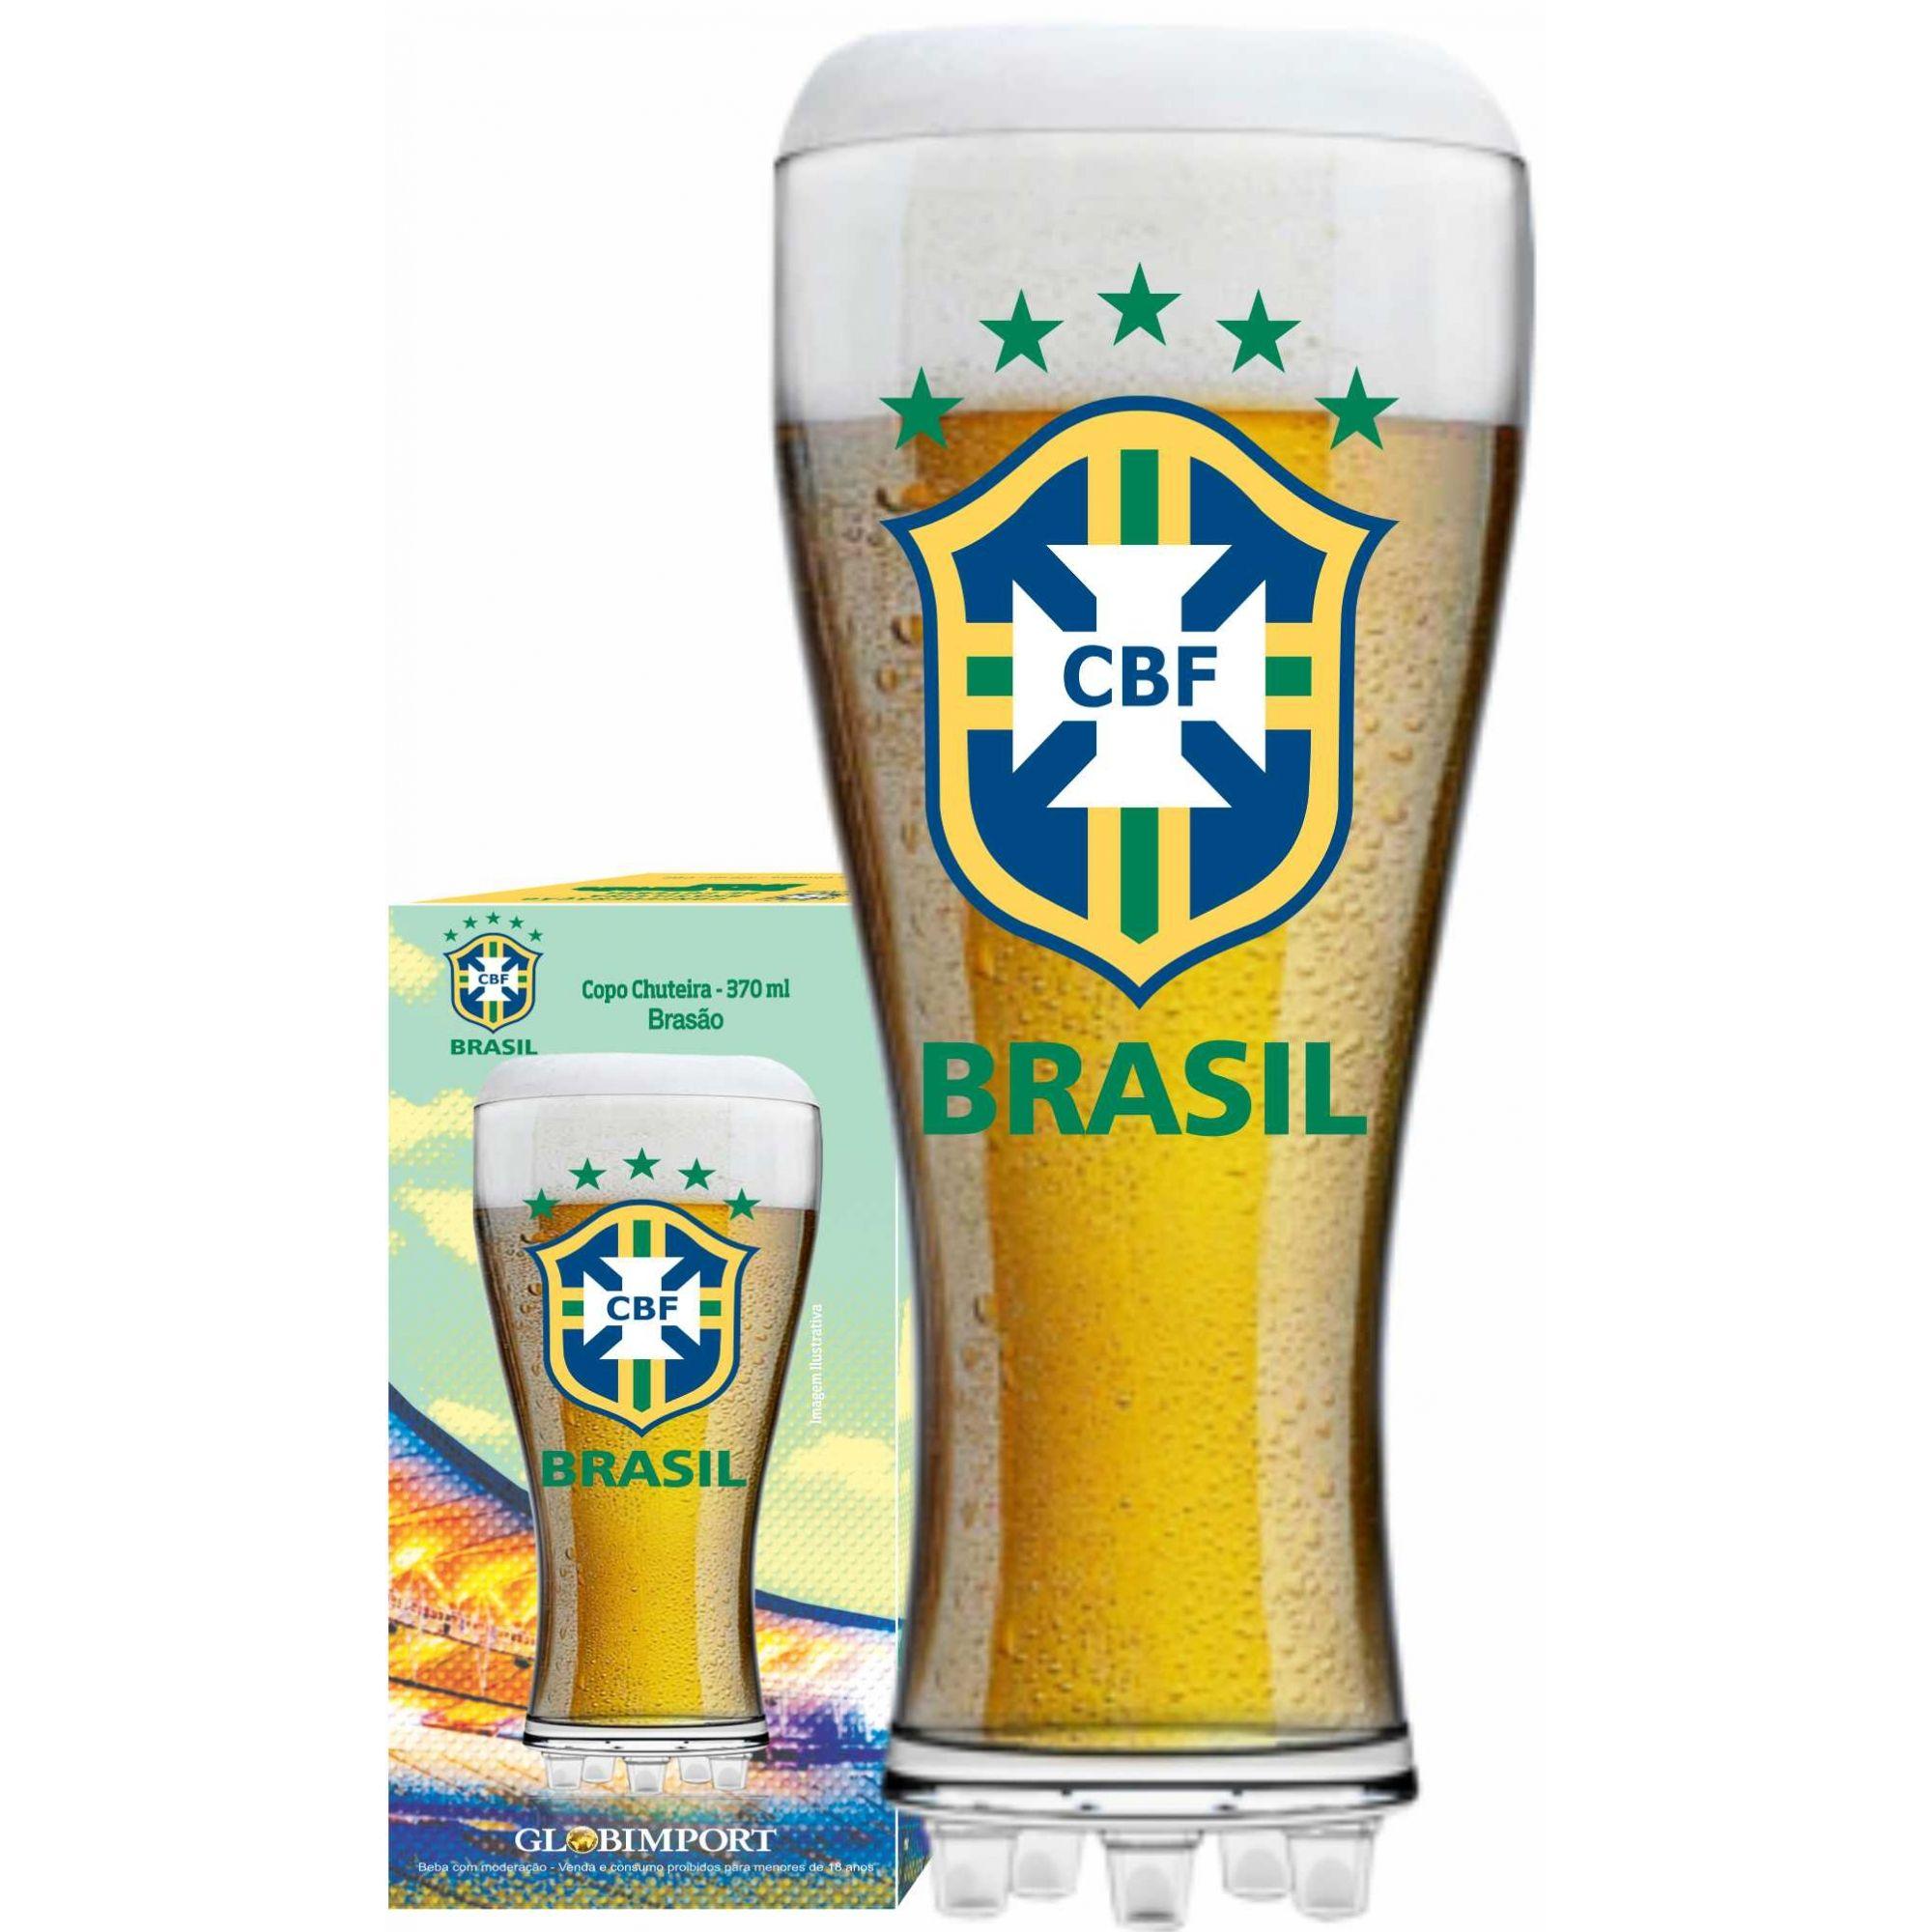 Copo Chuteira  CBF Brasão - 370 ml